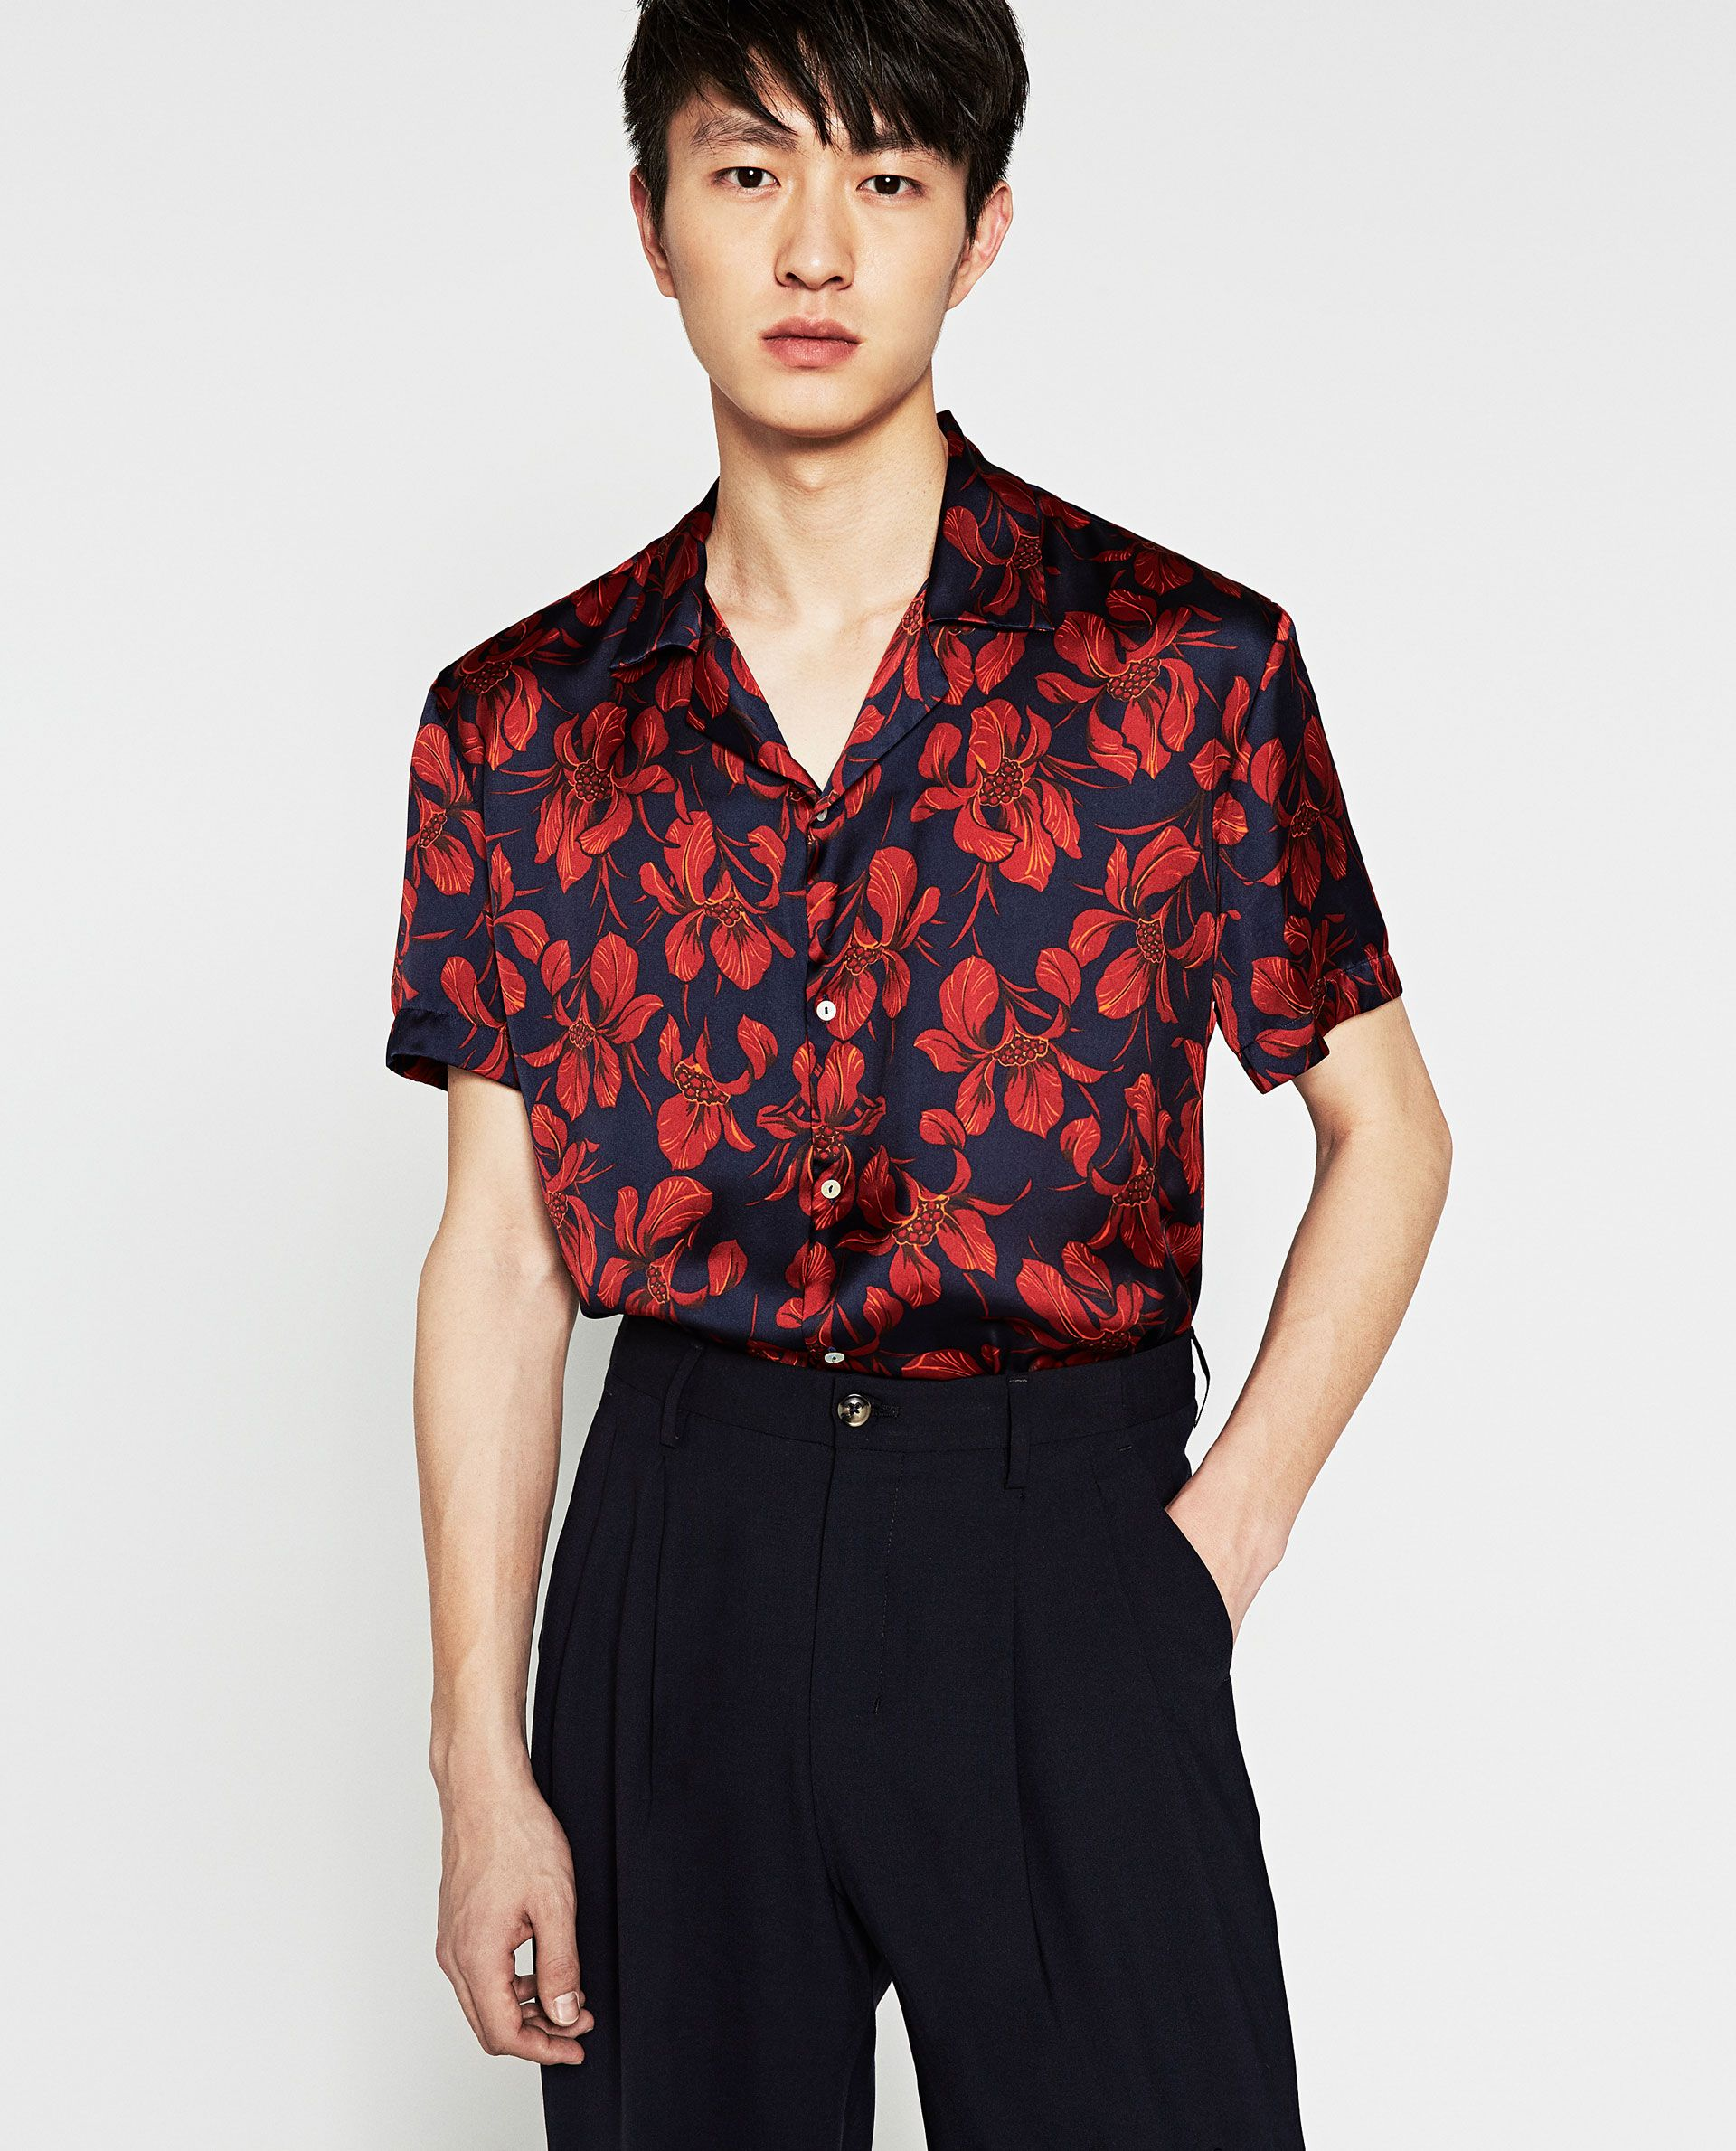 Printed floral shirt men 39 s shirt pinterest men for Zara mens floral shirt